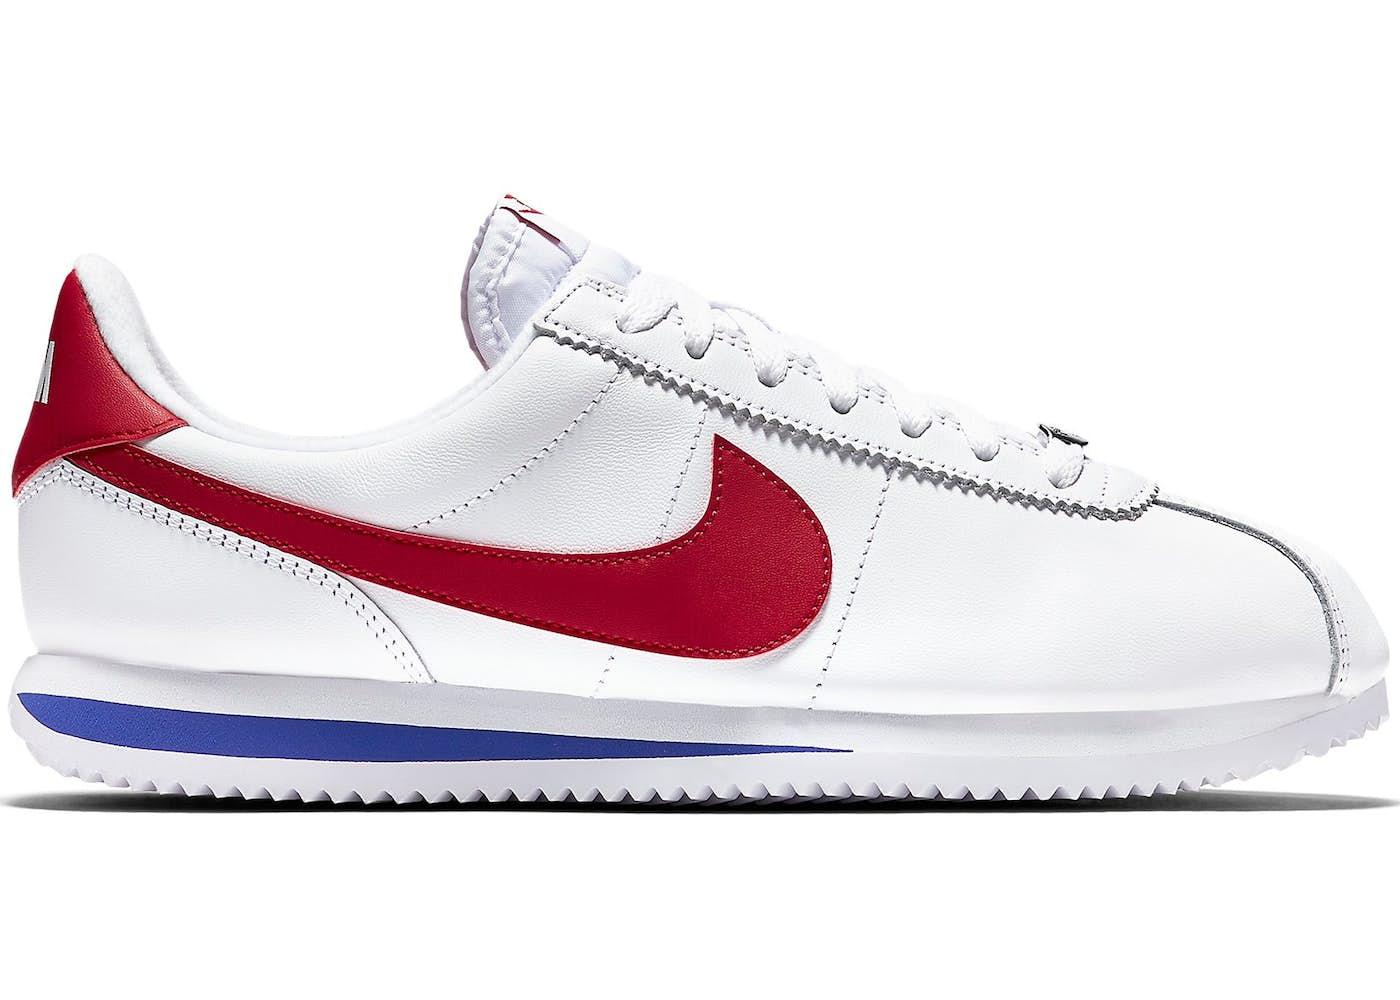 Nike Shoes High Range